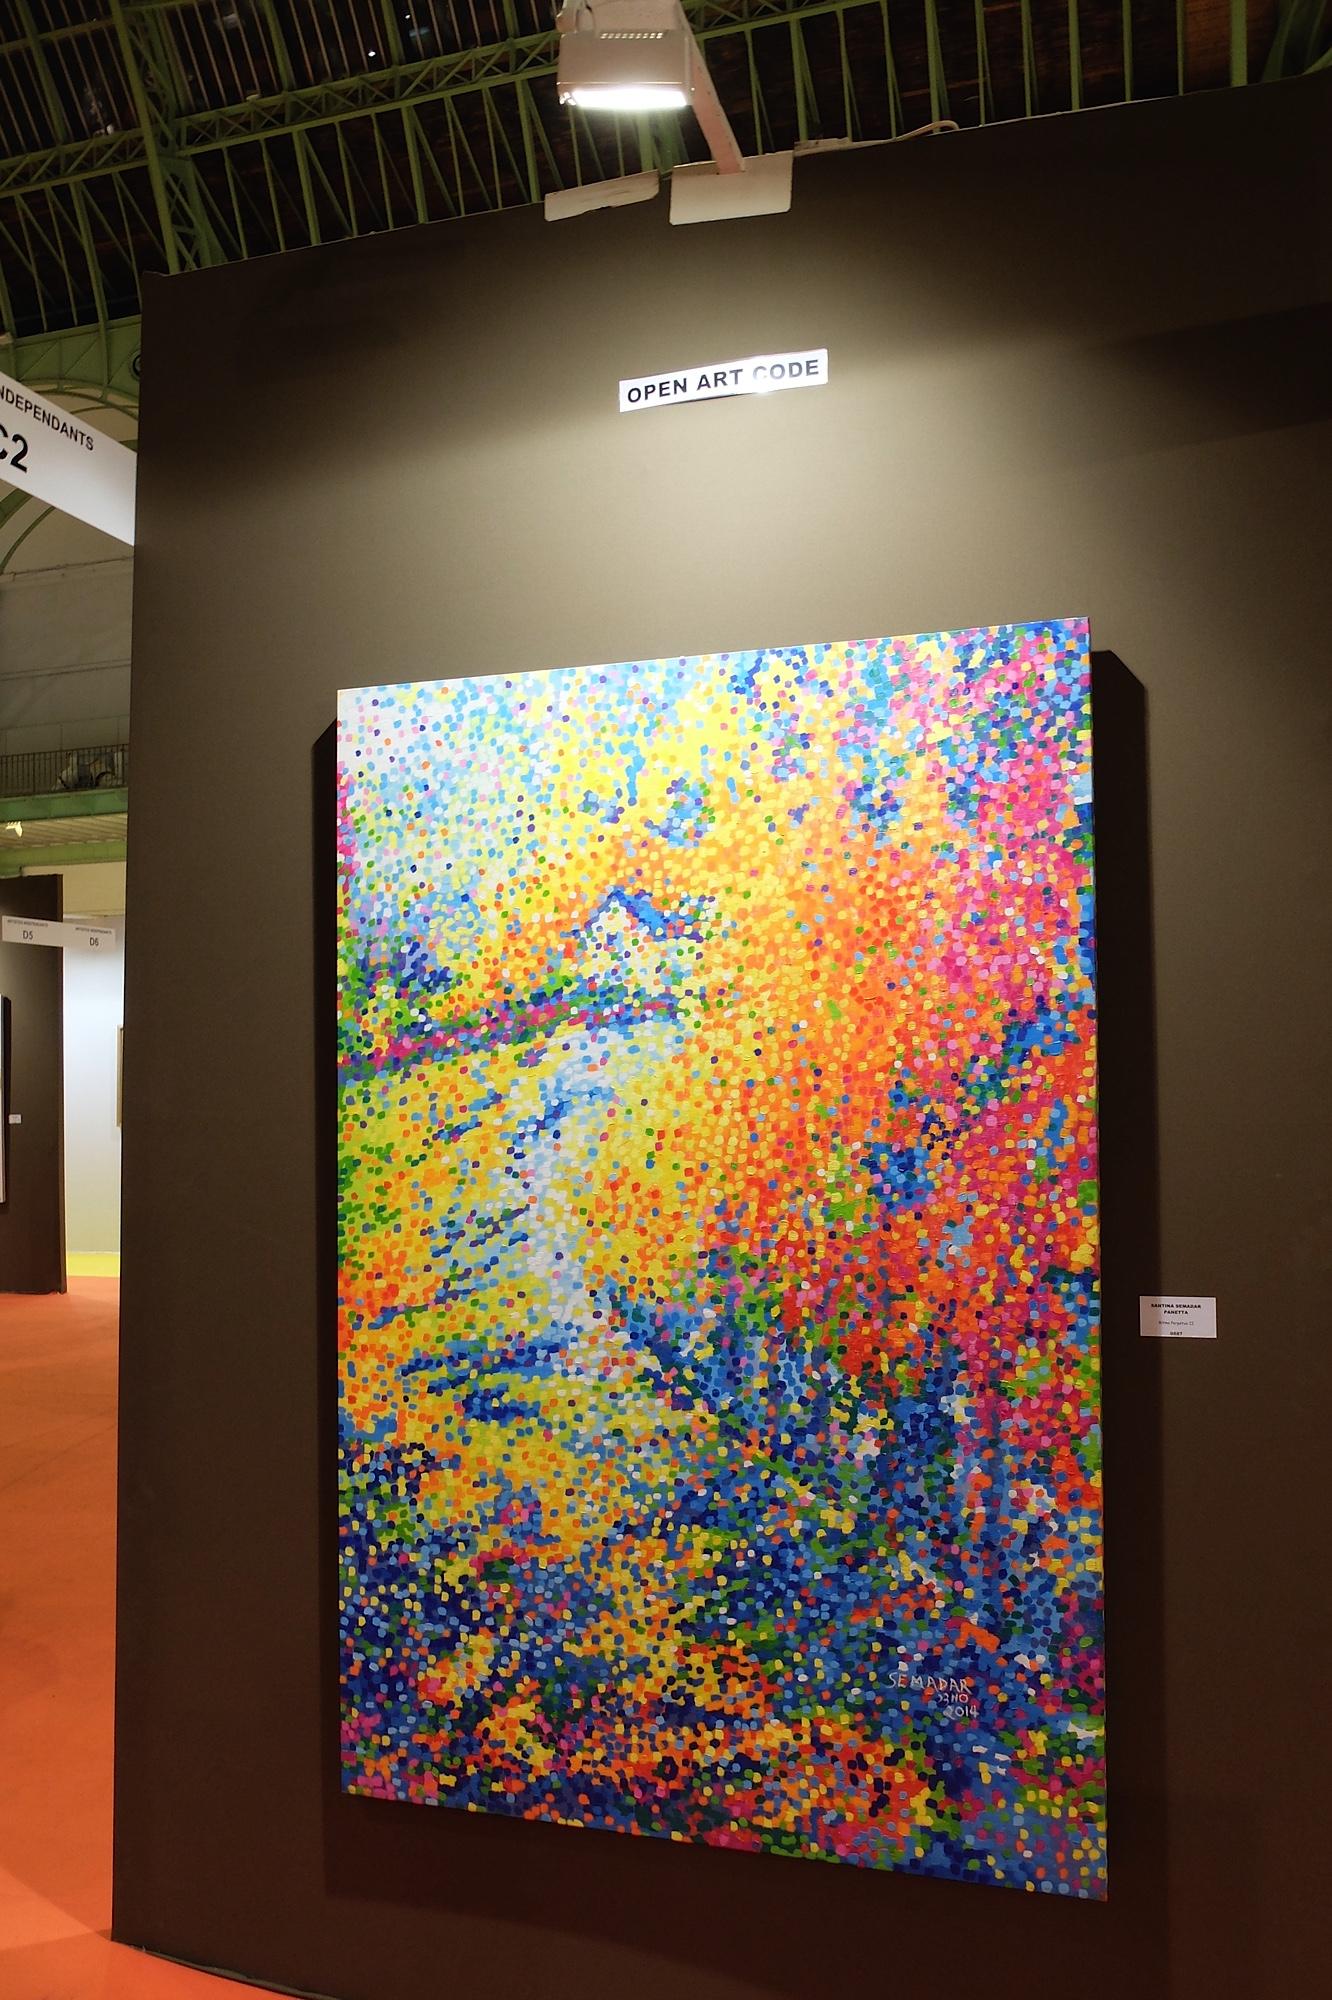 Open Art